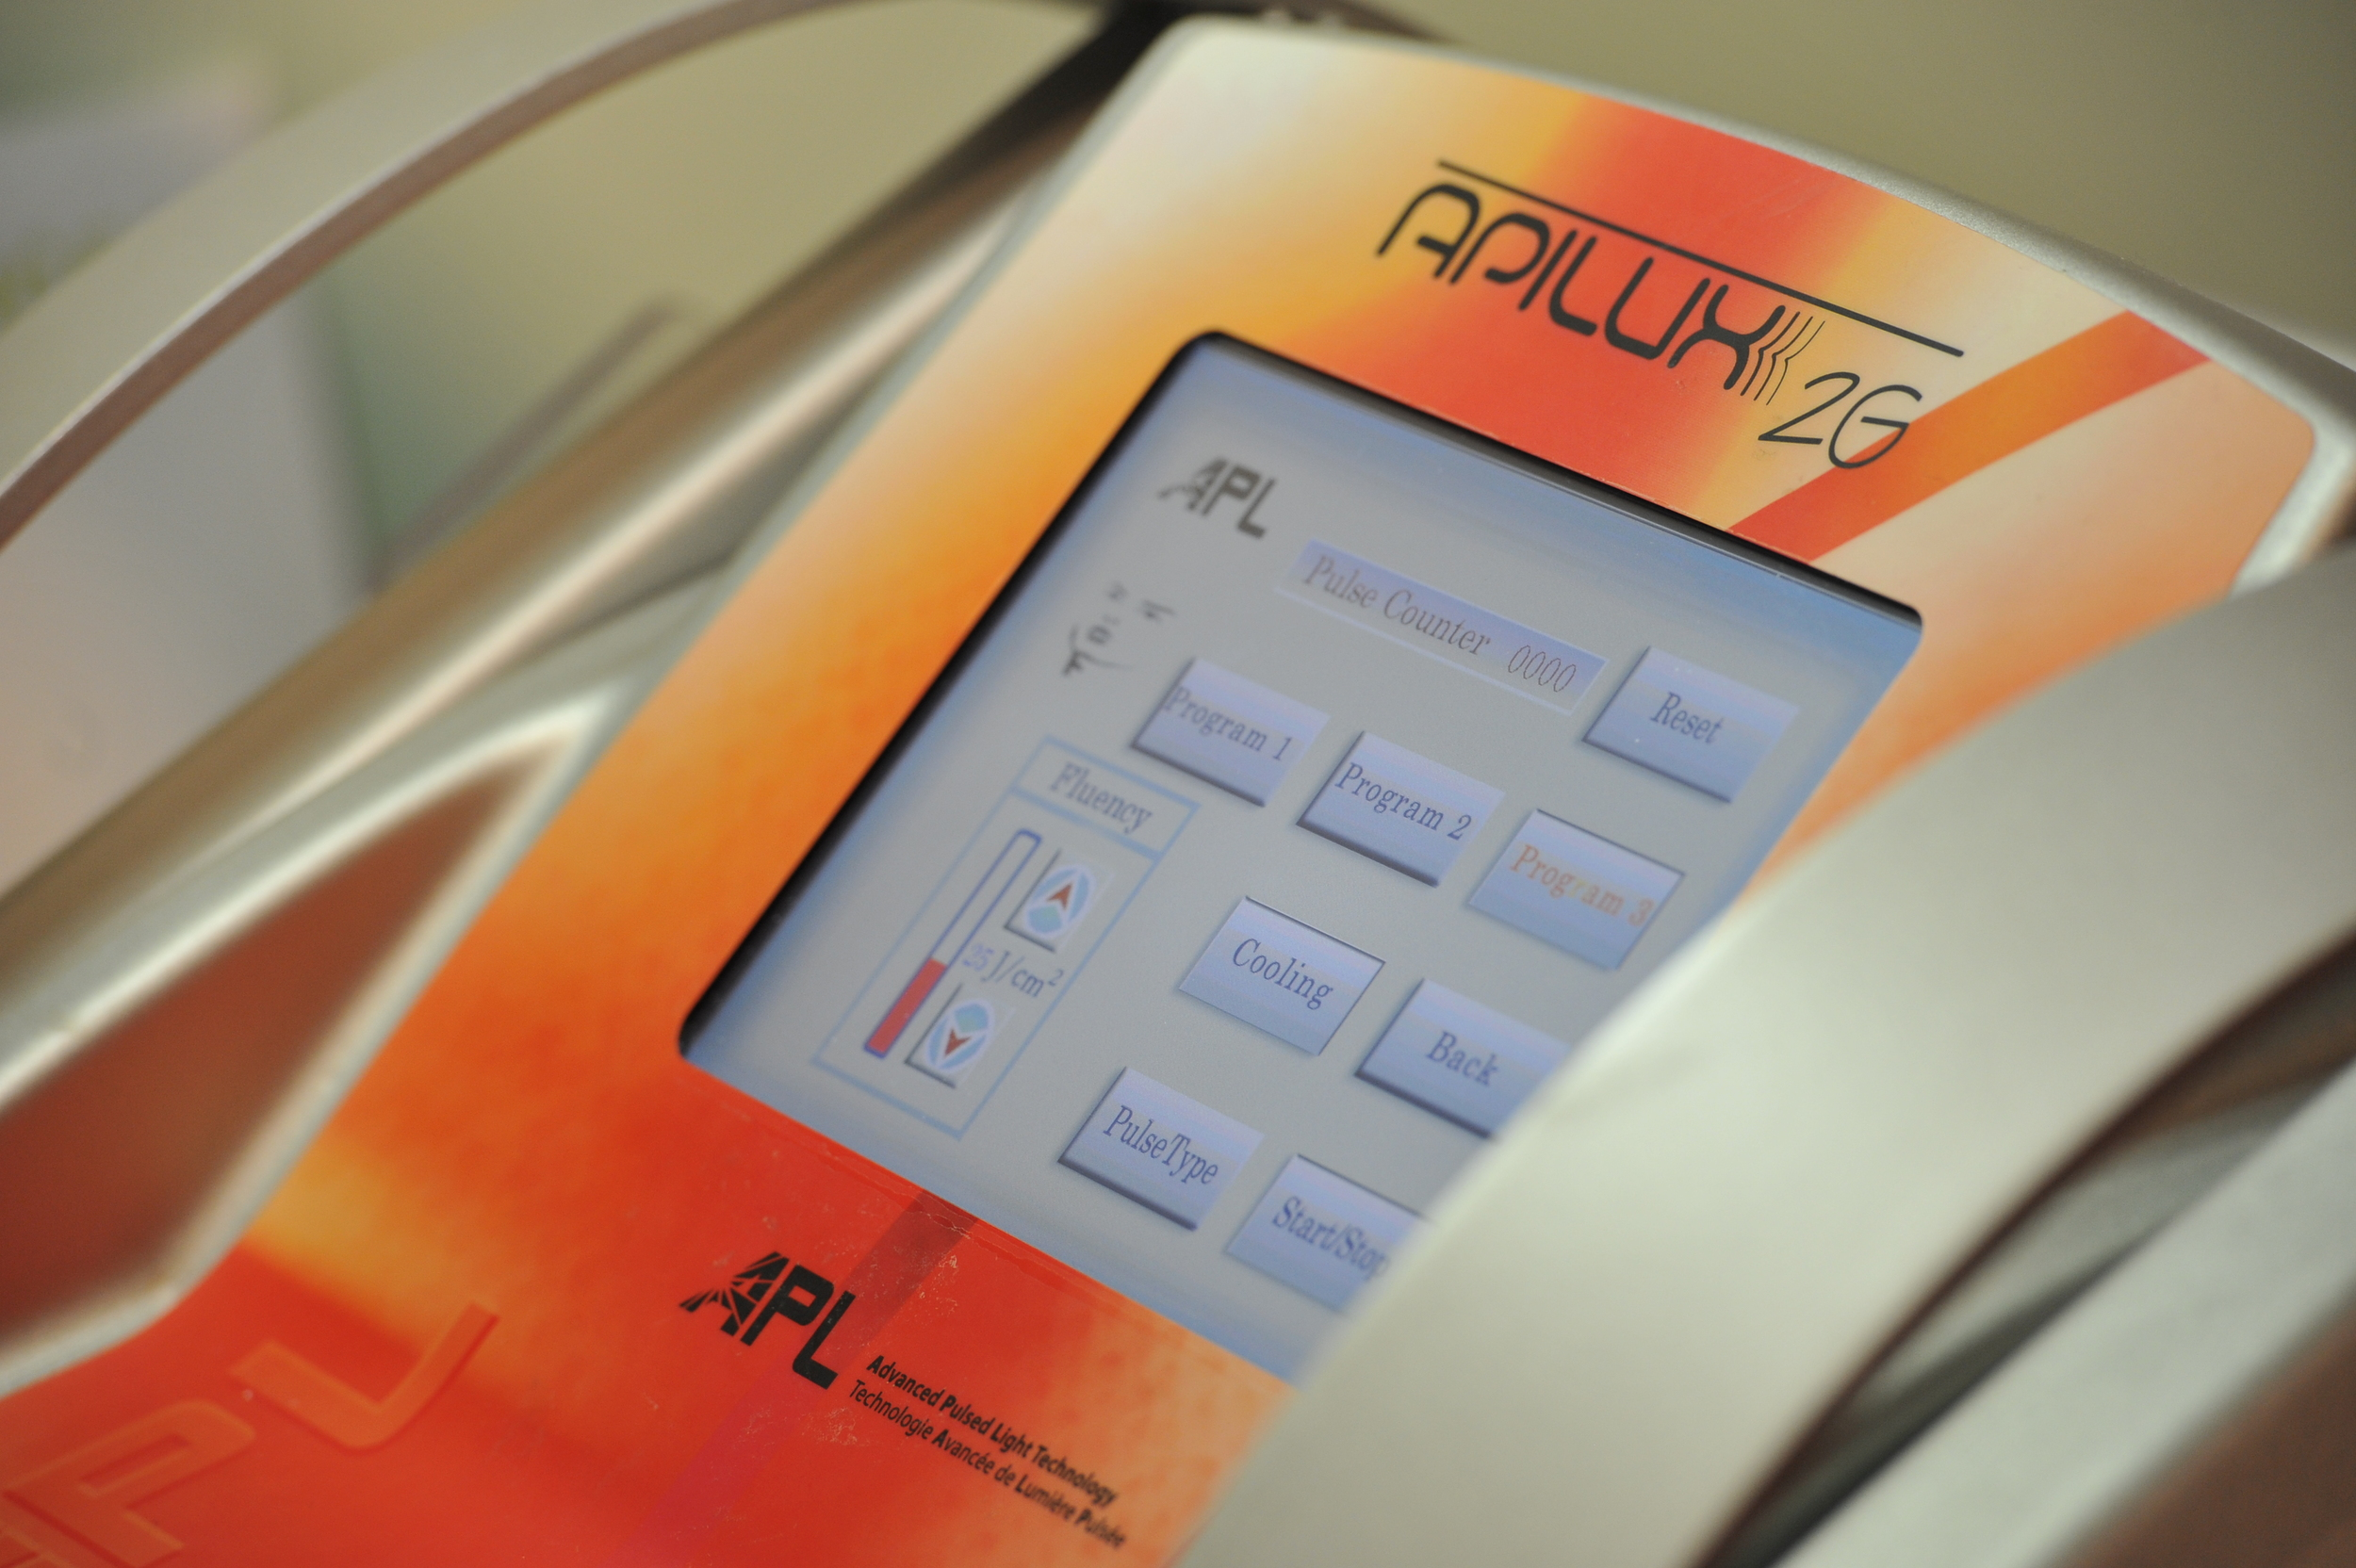 Apilux 2G: Η αποτρίχωση εύκολα, γρήγορα και ανώδυνα!